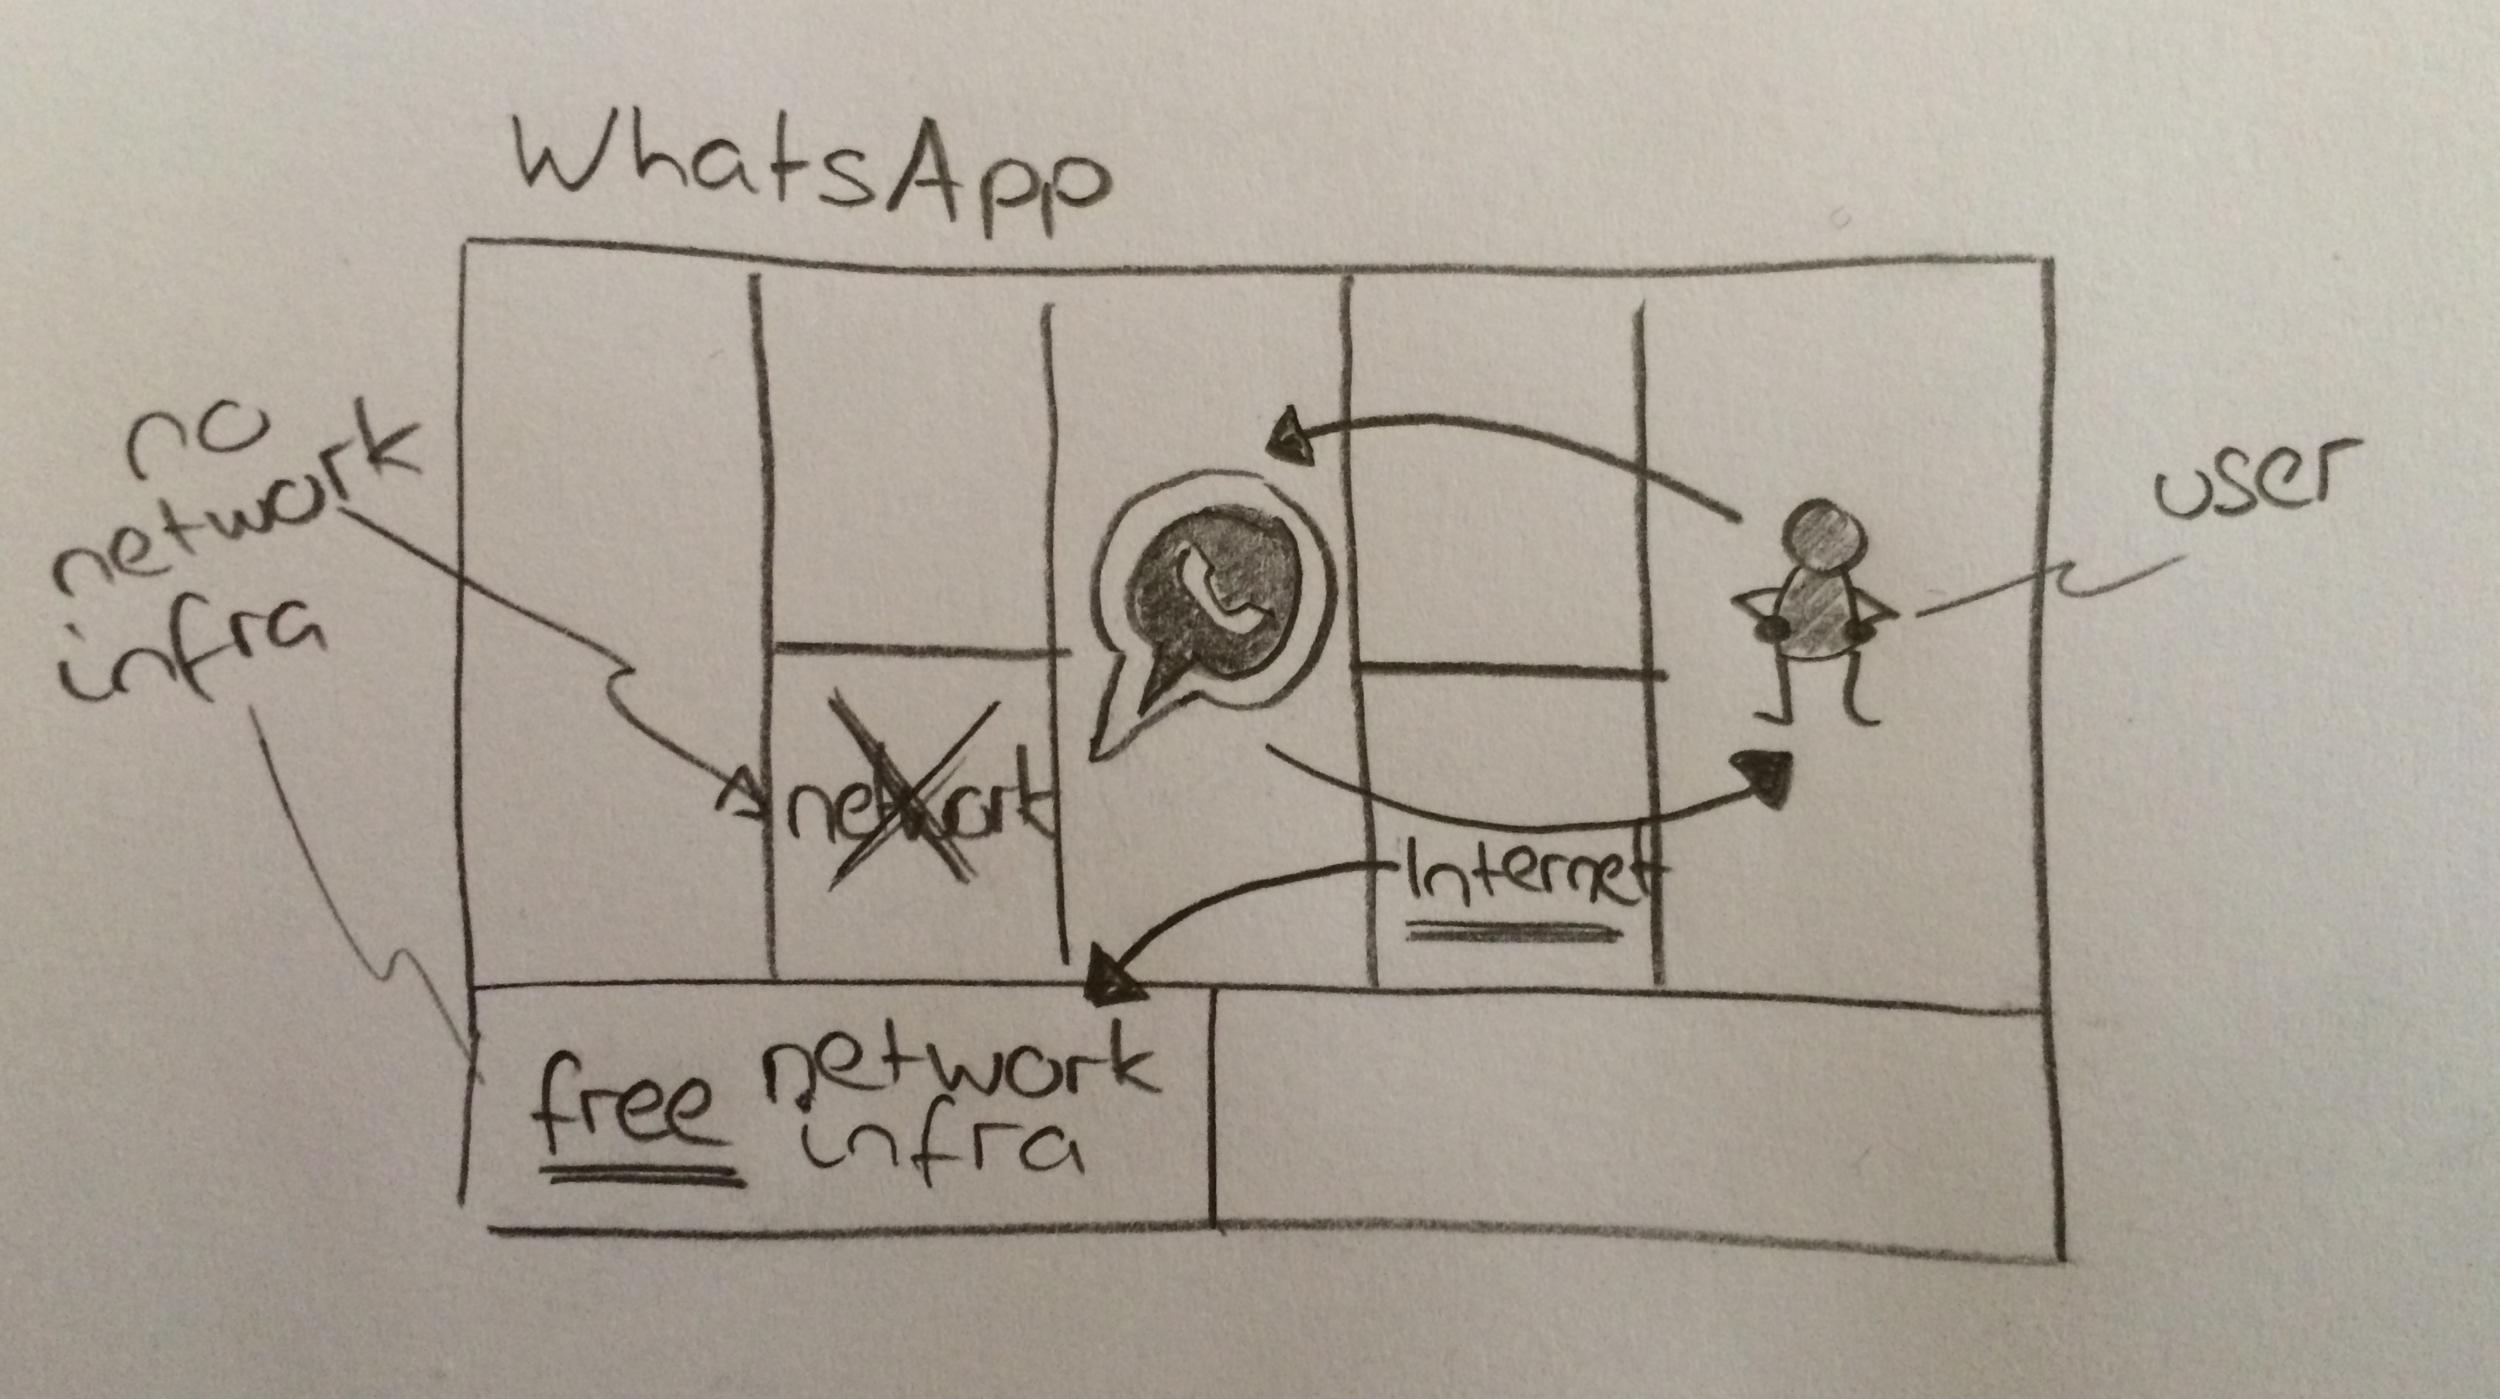 whatsapp-business-model.png